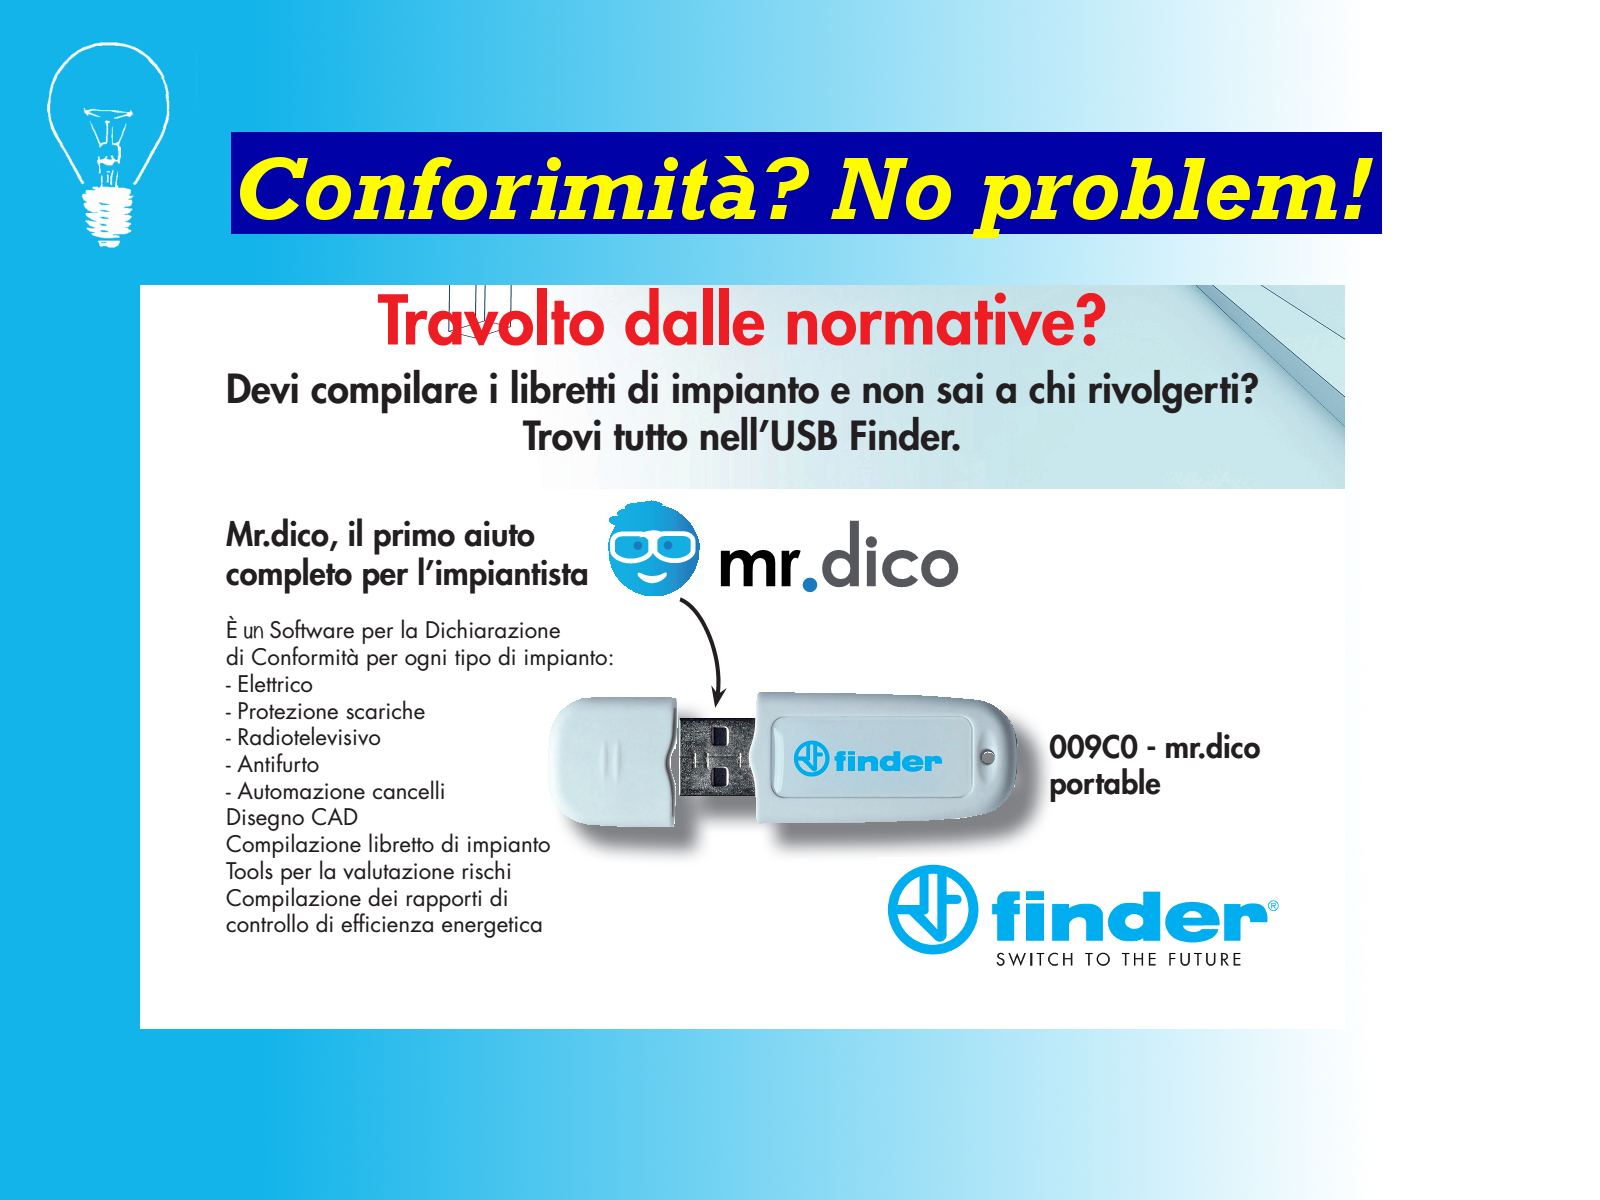 mrdicoFINDER.jpg